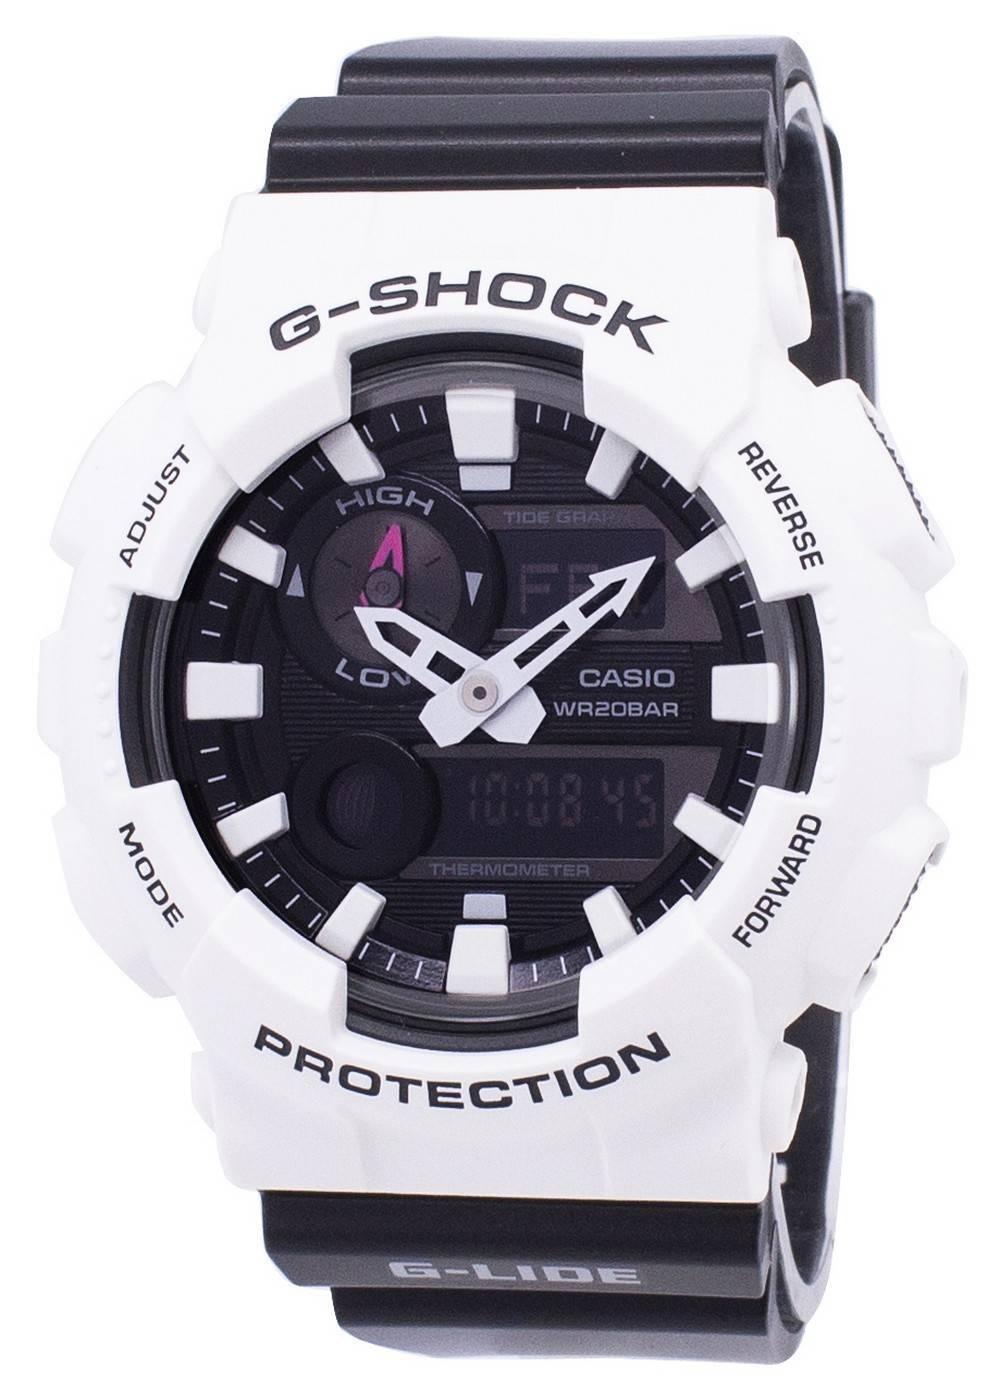 6bb0bfba147b Casio G-Shock G-Lide Analog Digital GAX-100B-7A Mens Watch